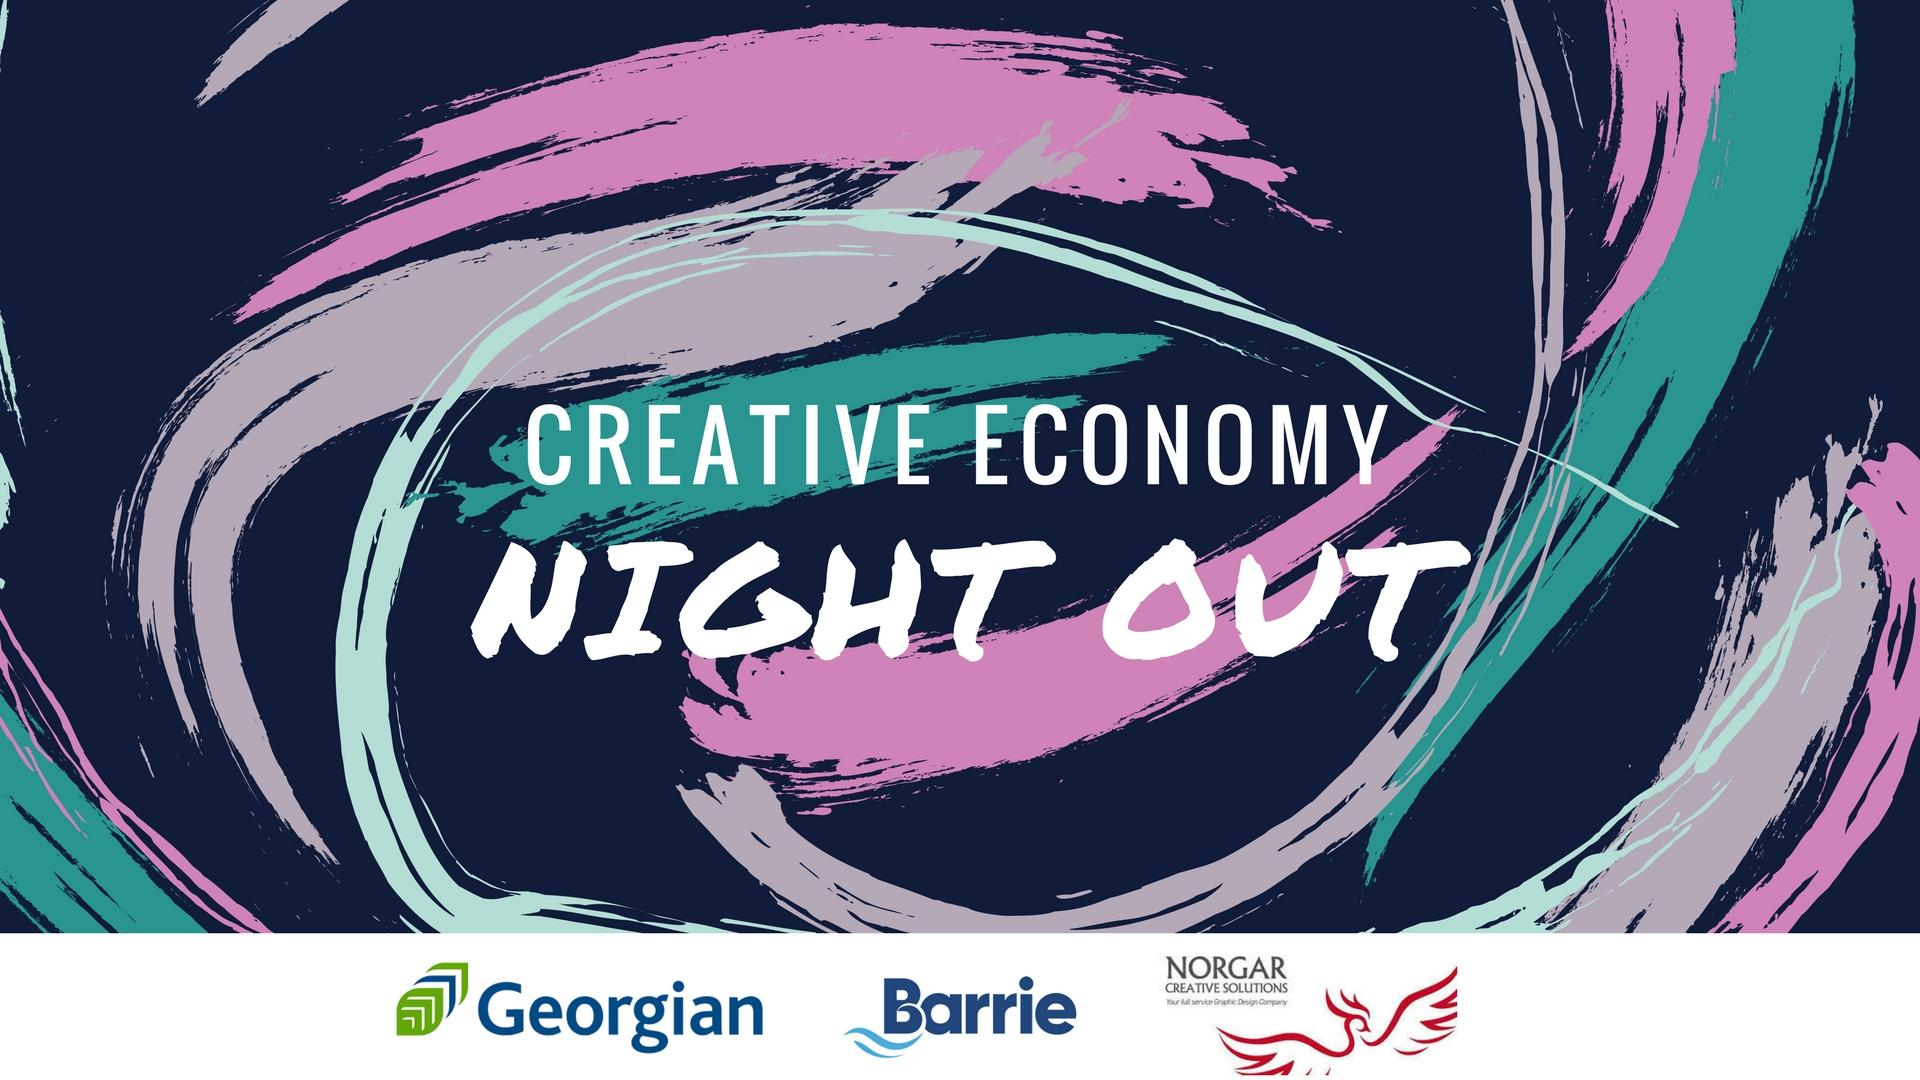 Creative Economy Night Out - February 2018